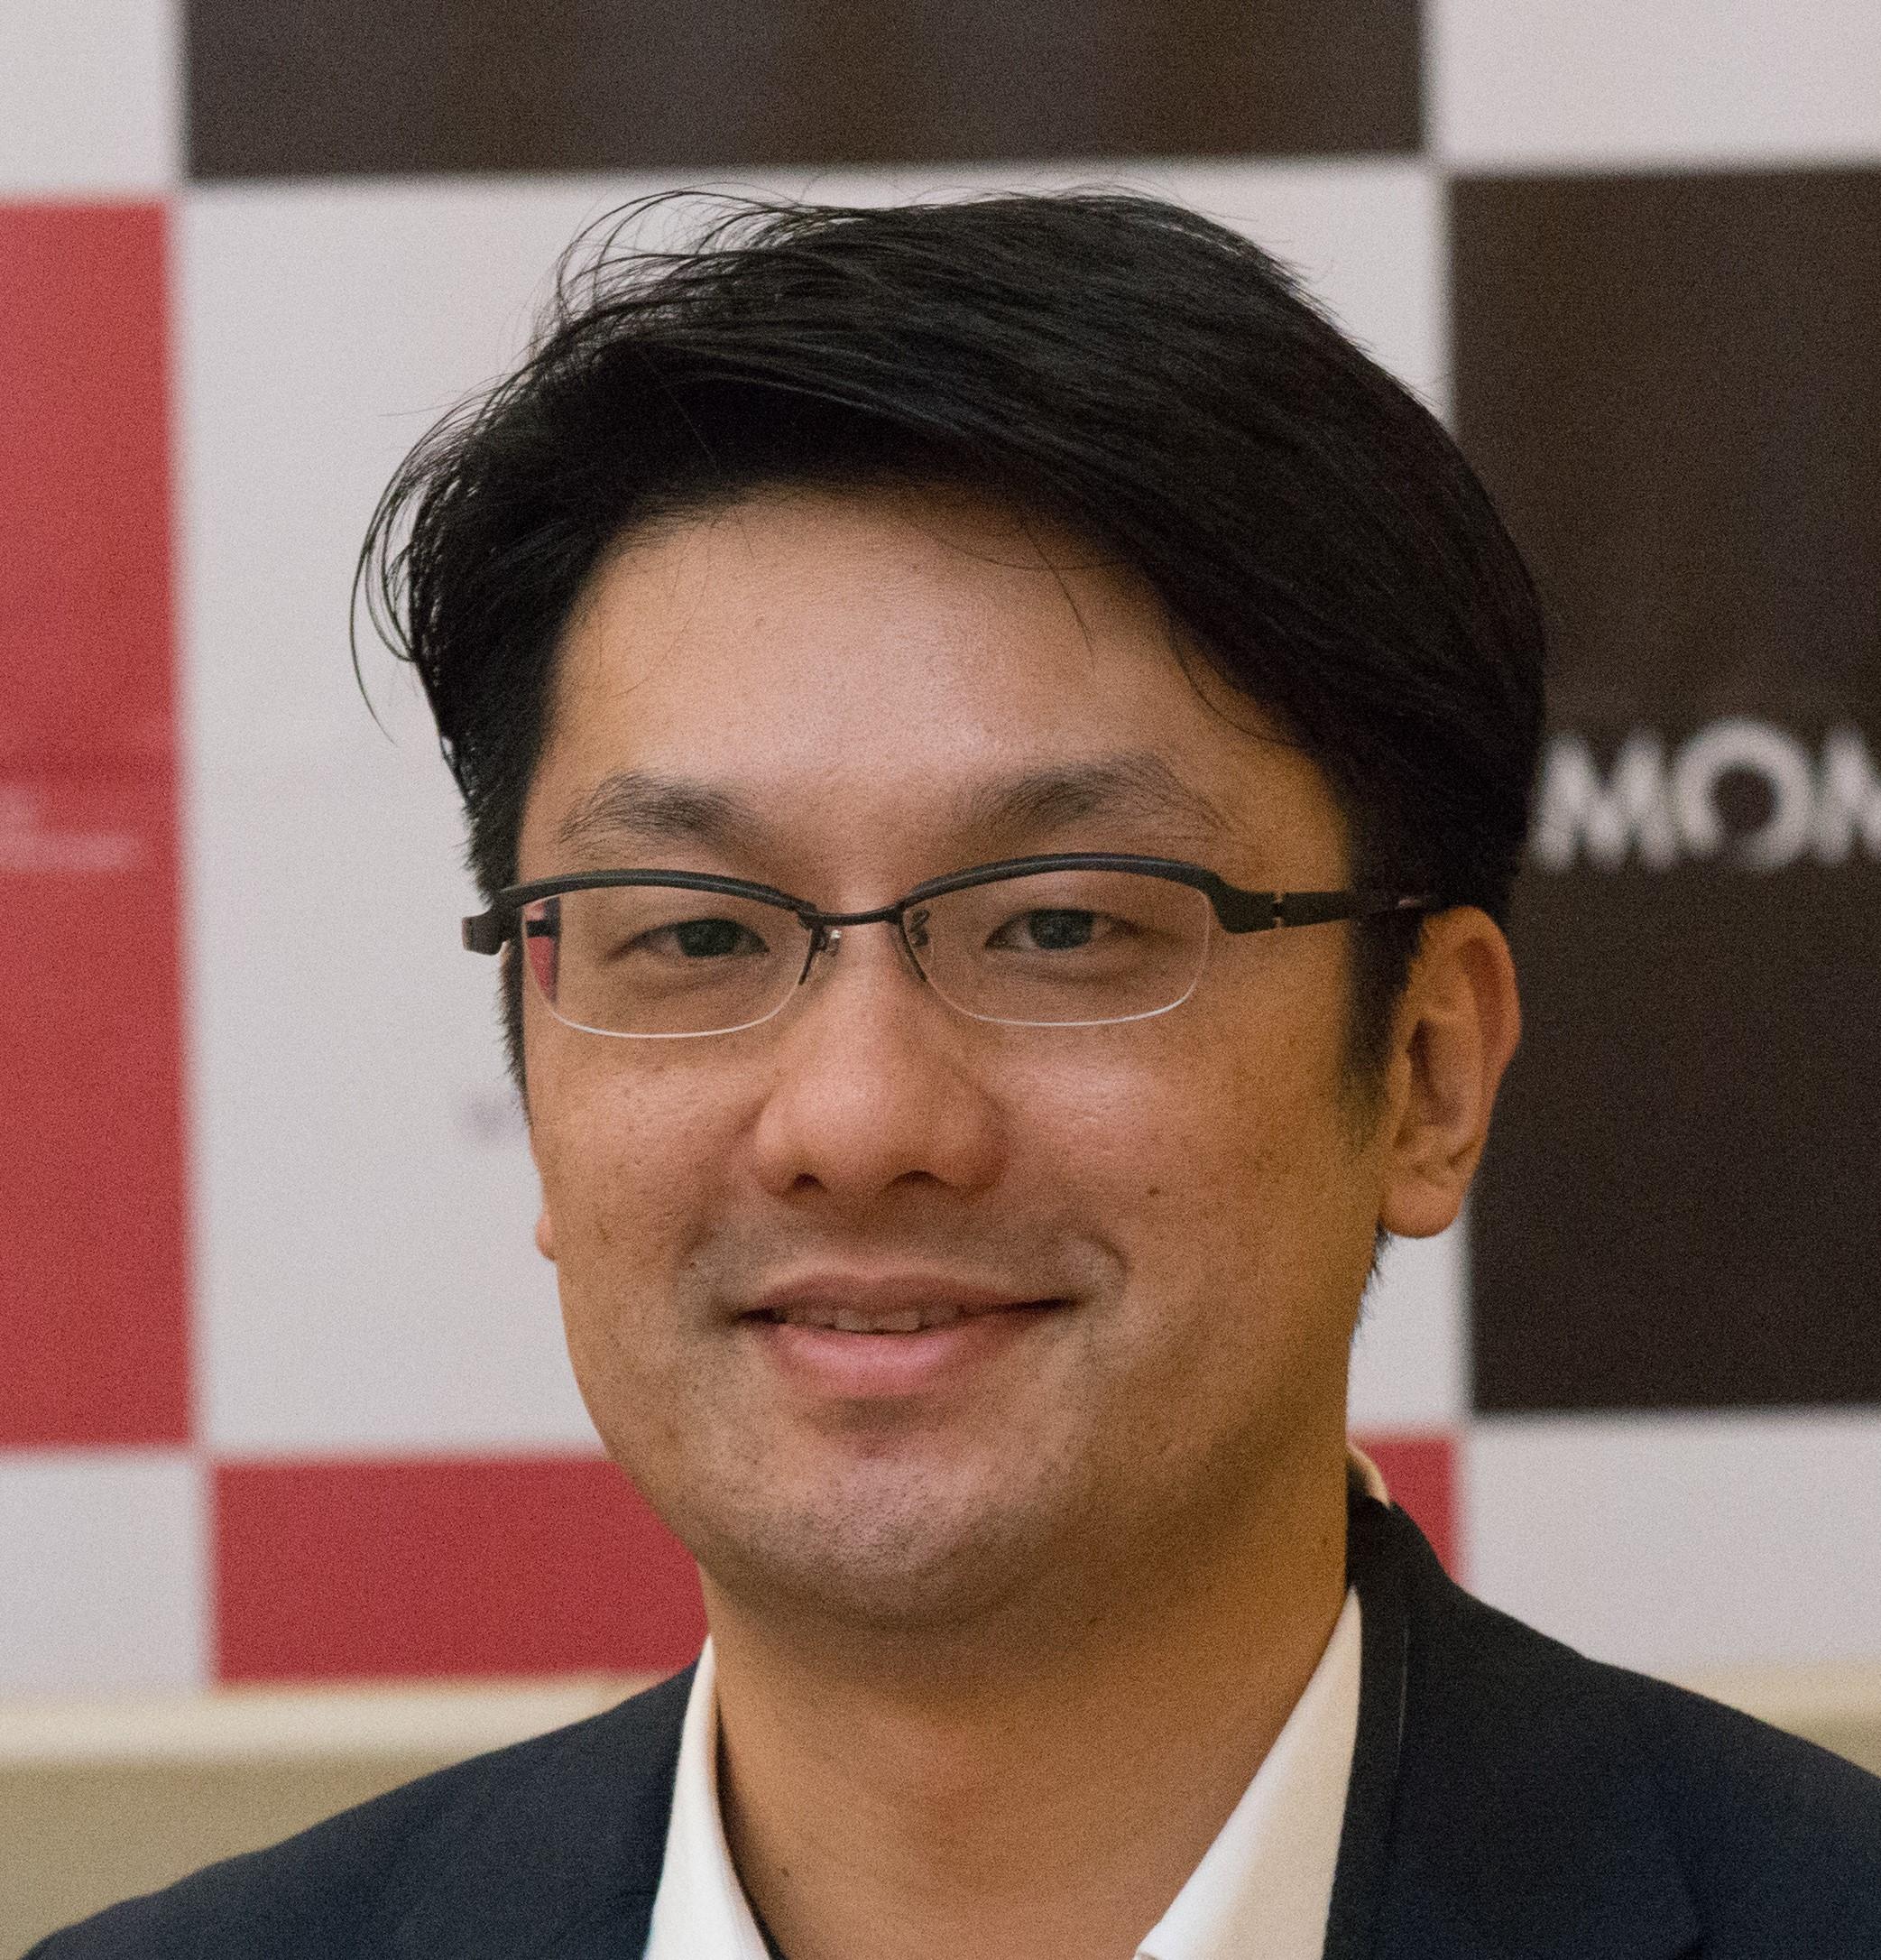 岡橋 寛明